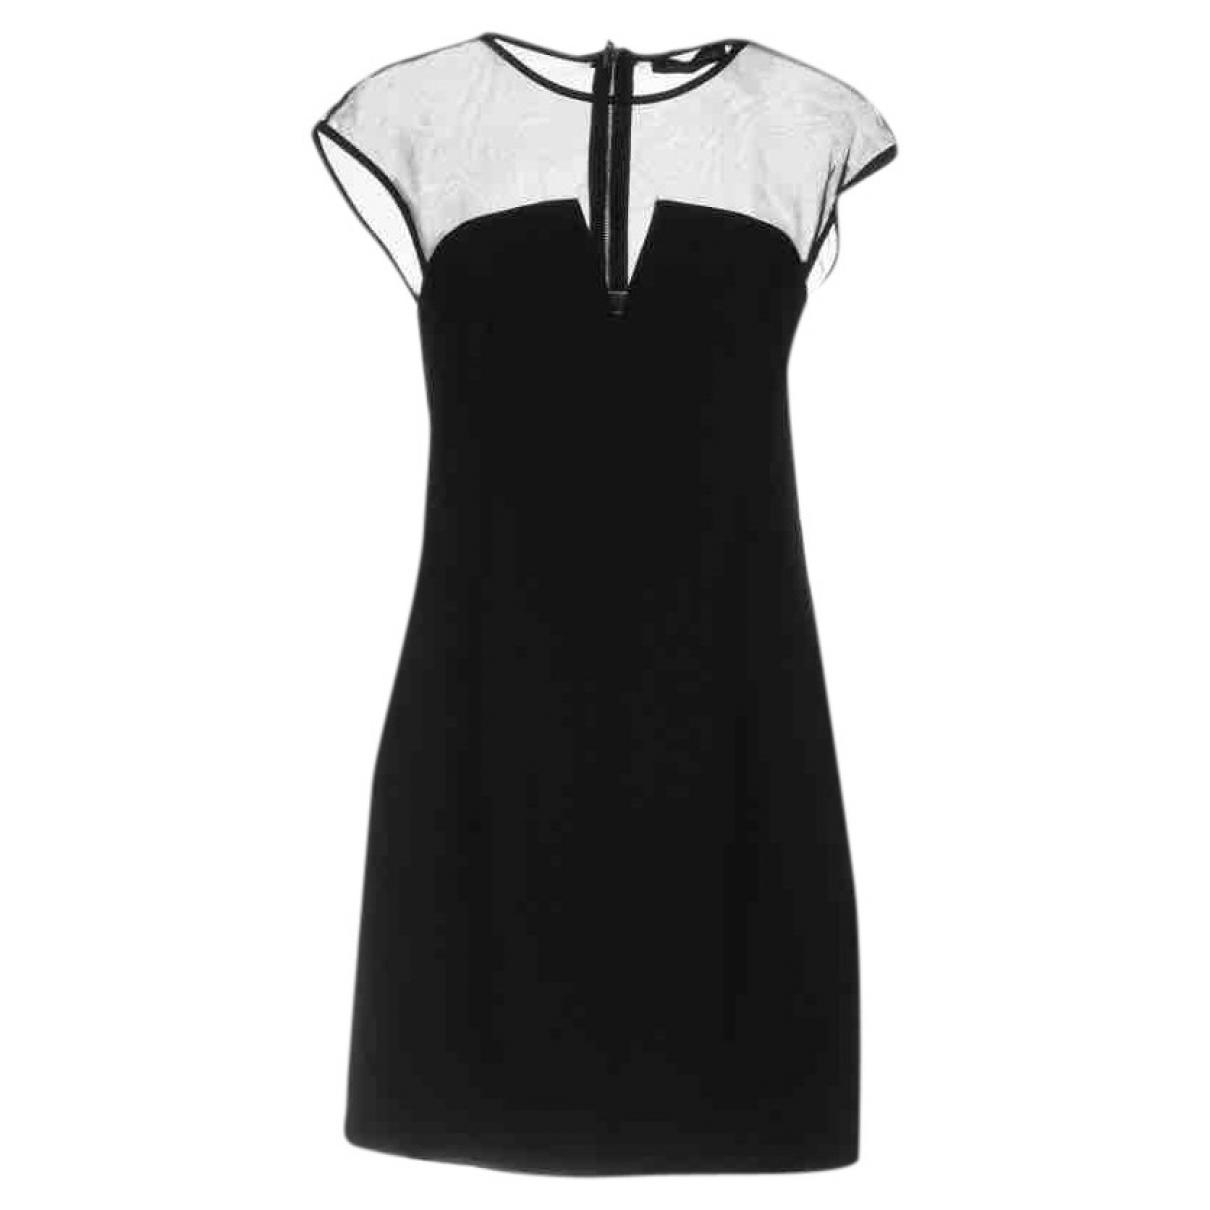 Mangano \N Black dress for Women 38 IT